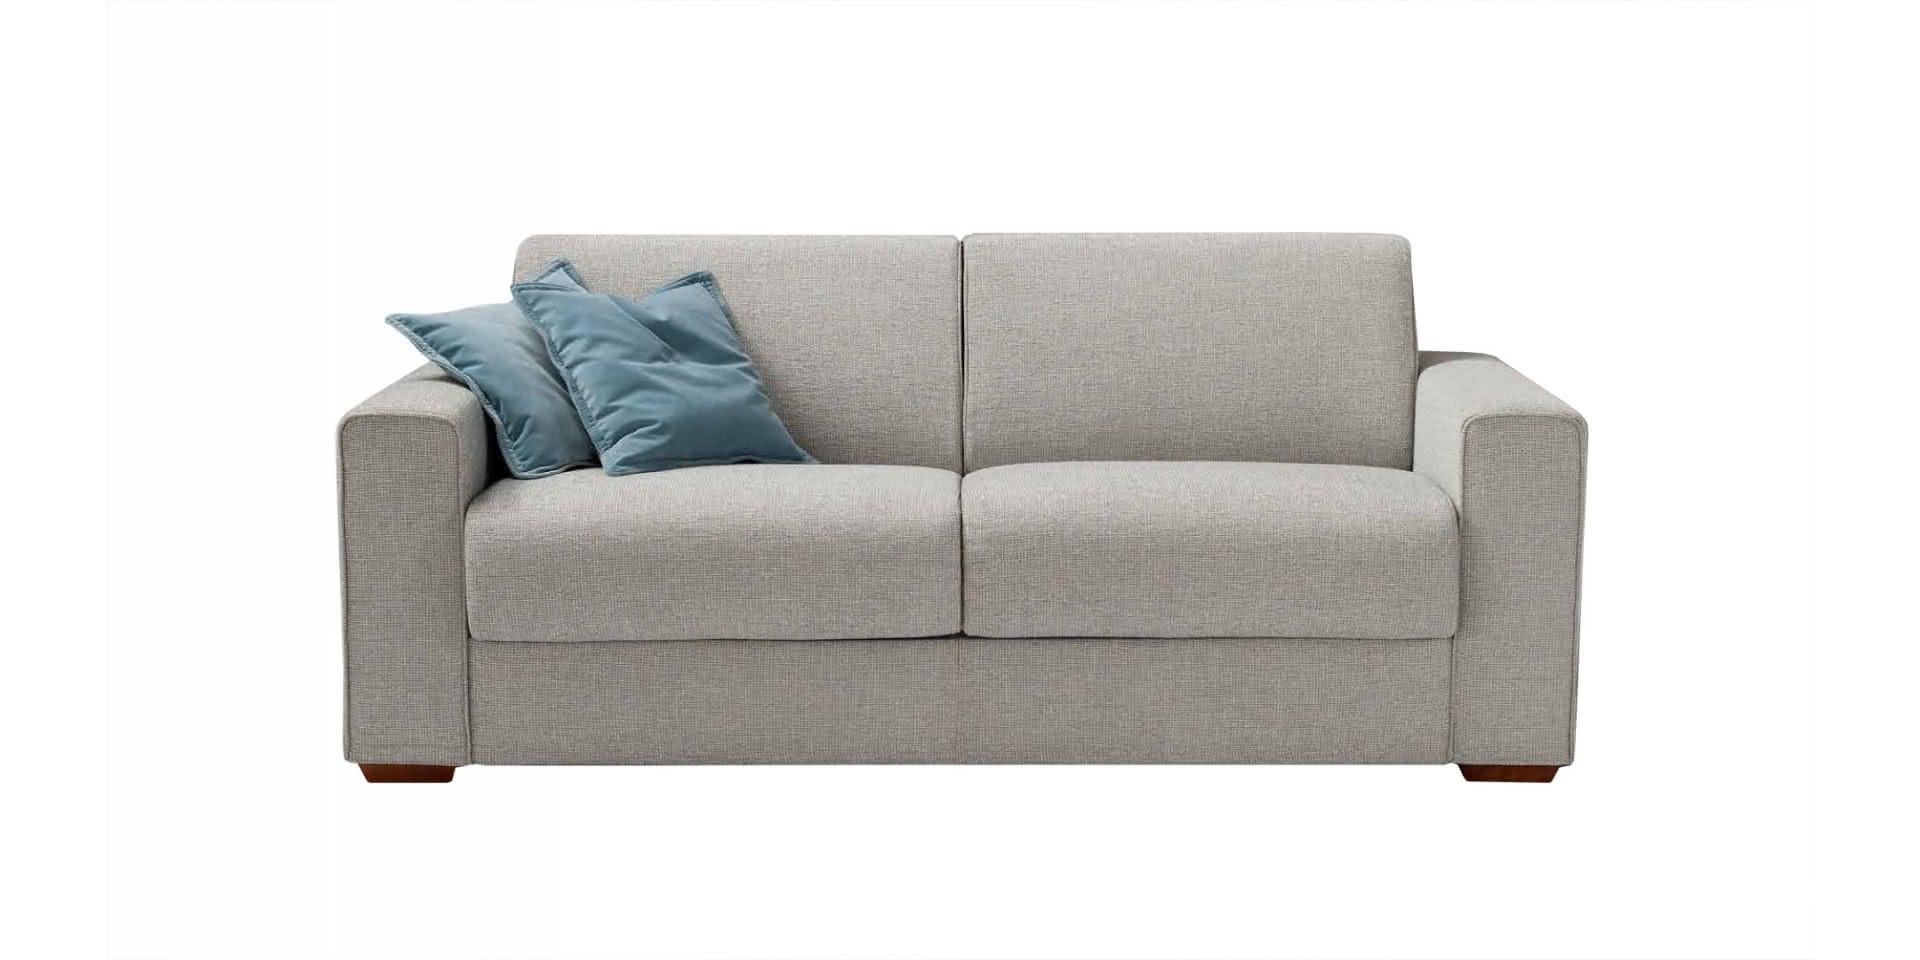 dalton sofa bed leather modern sets piu design by musa